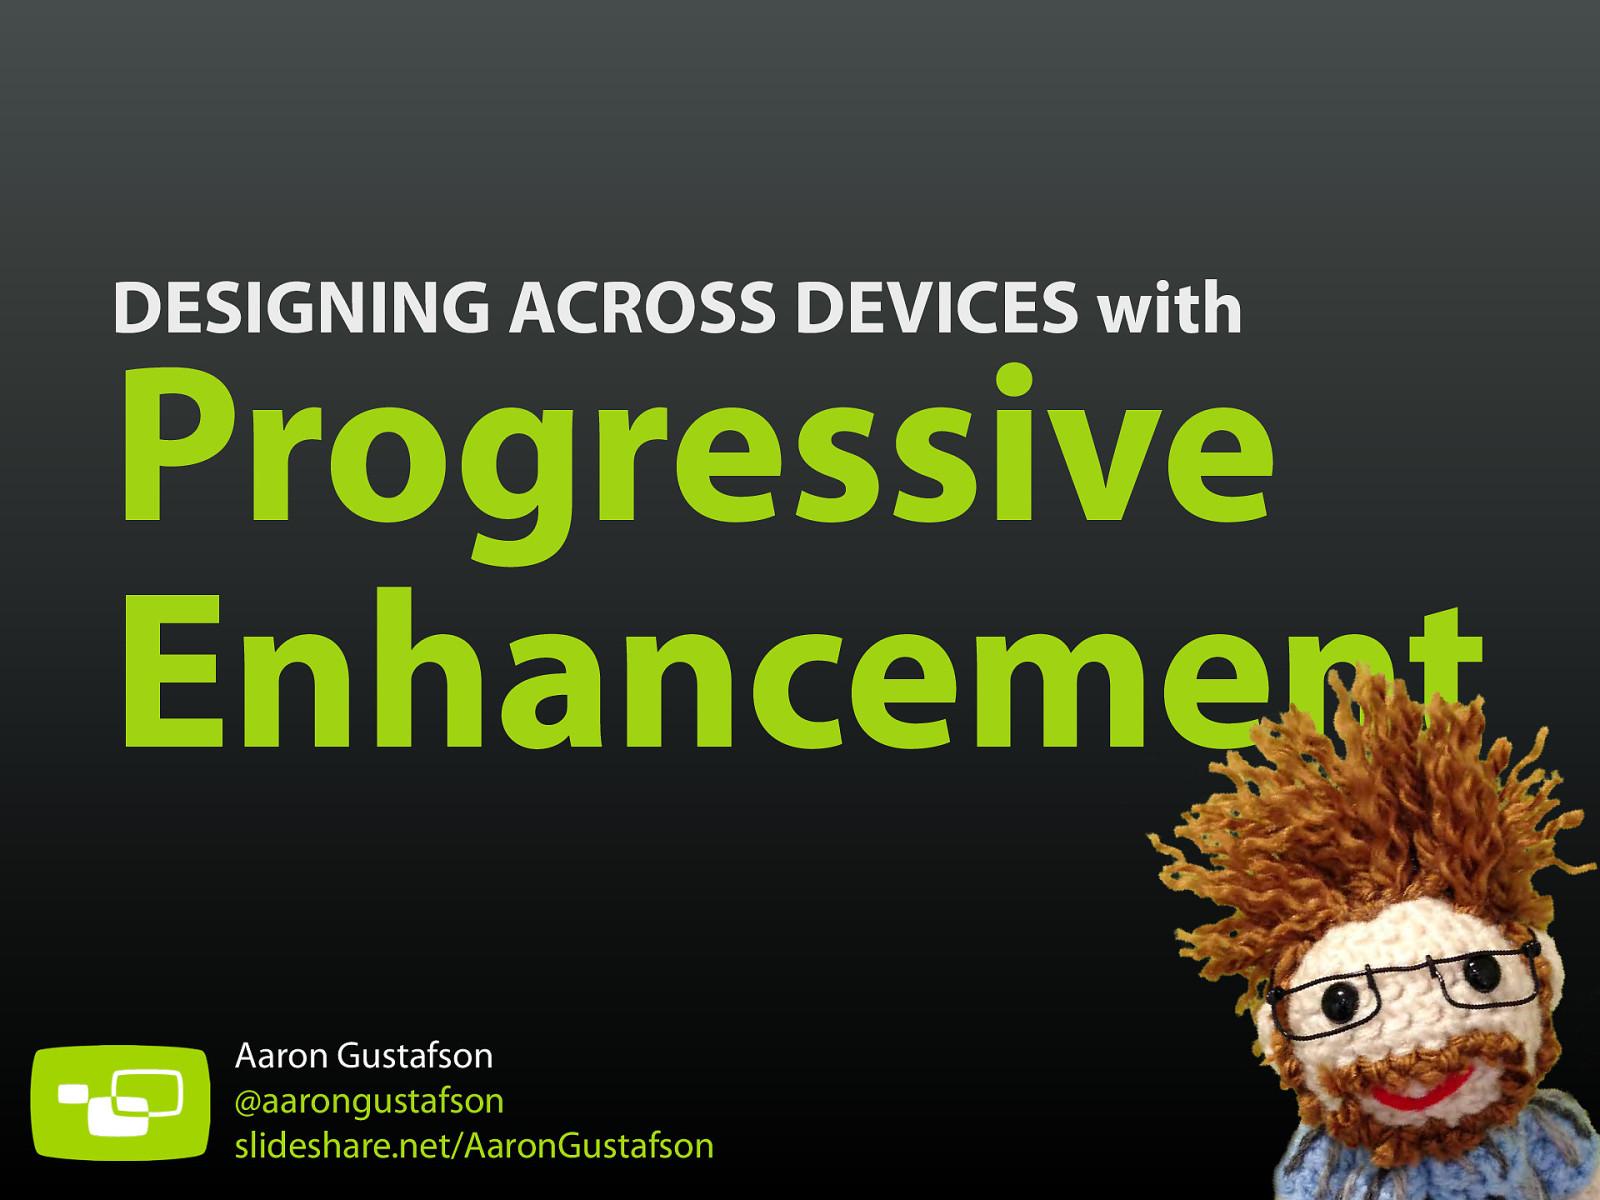 Designing Across Devices with Progressive Enhancement